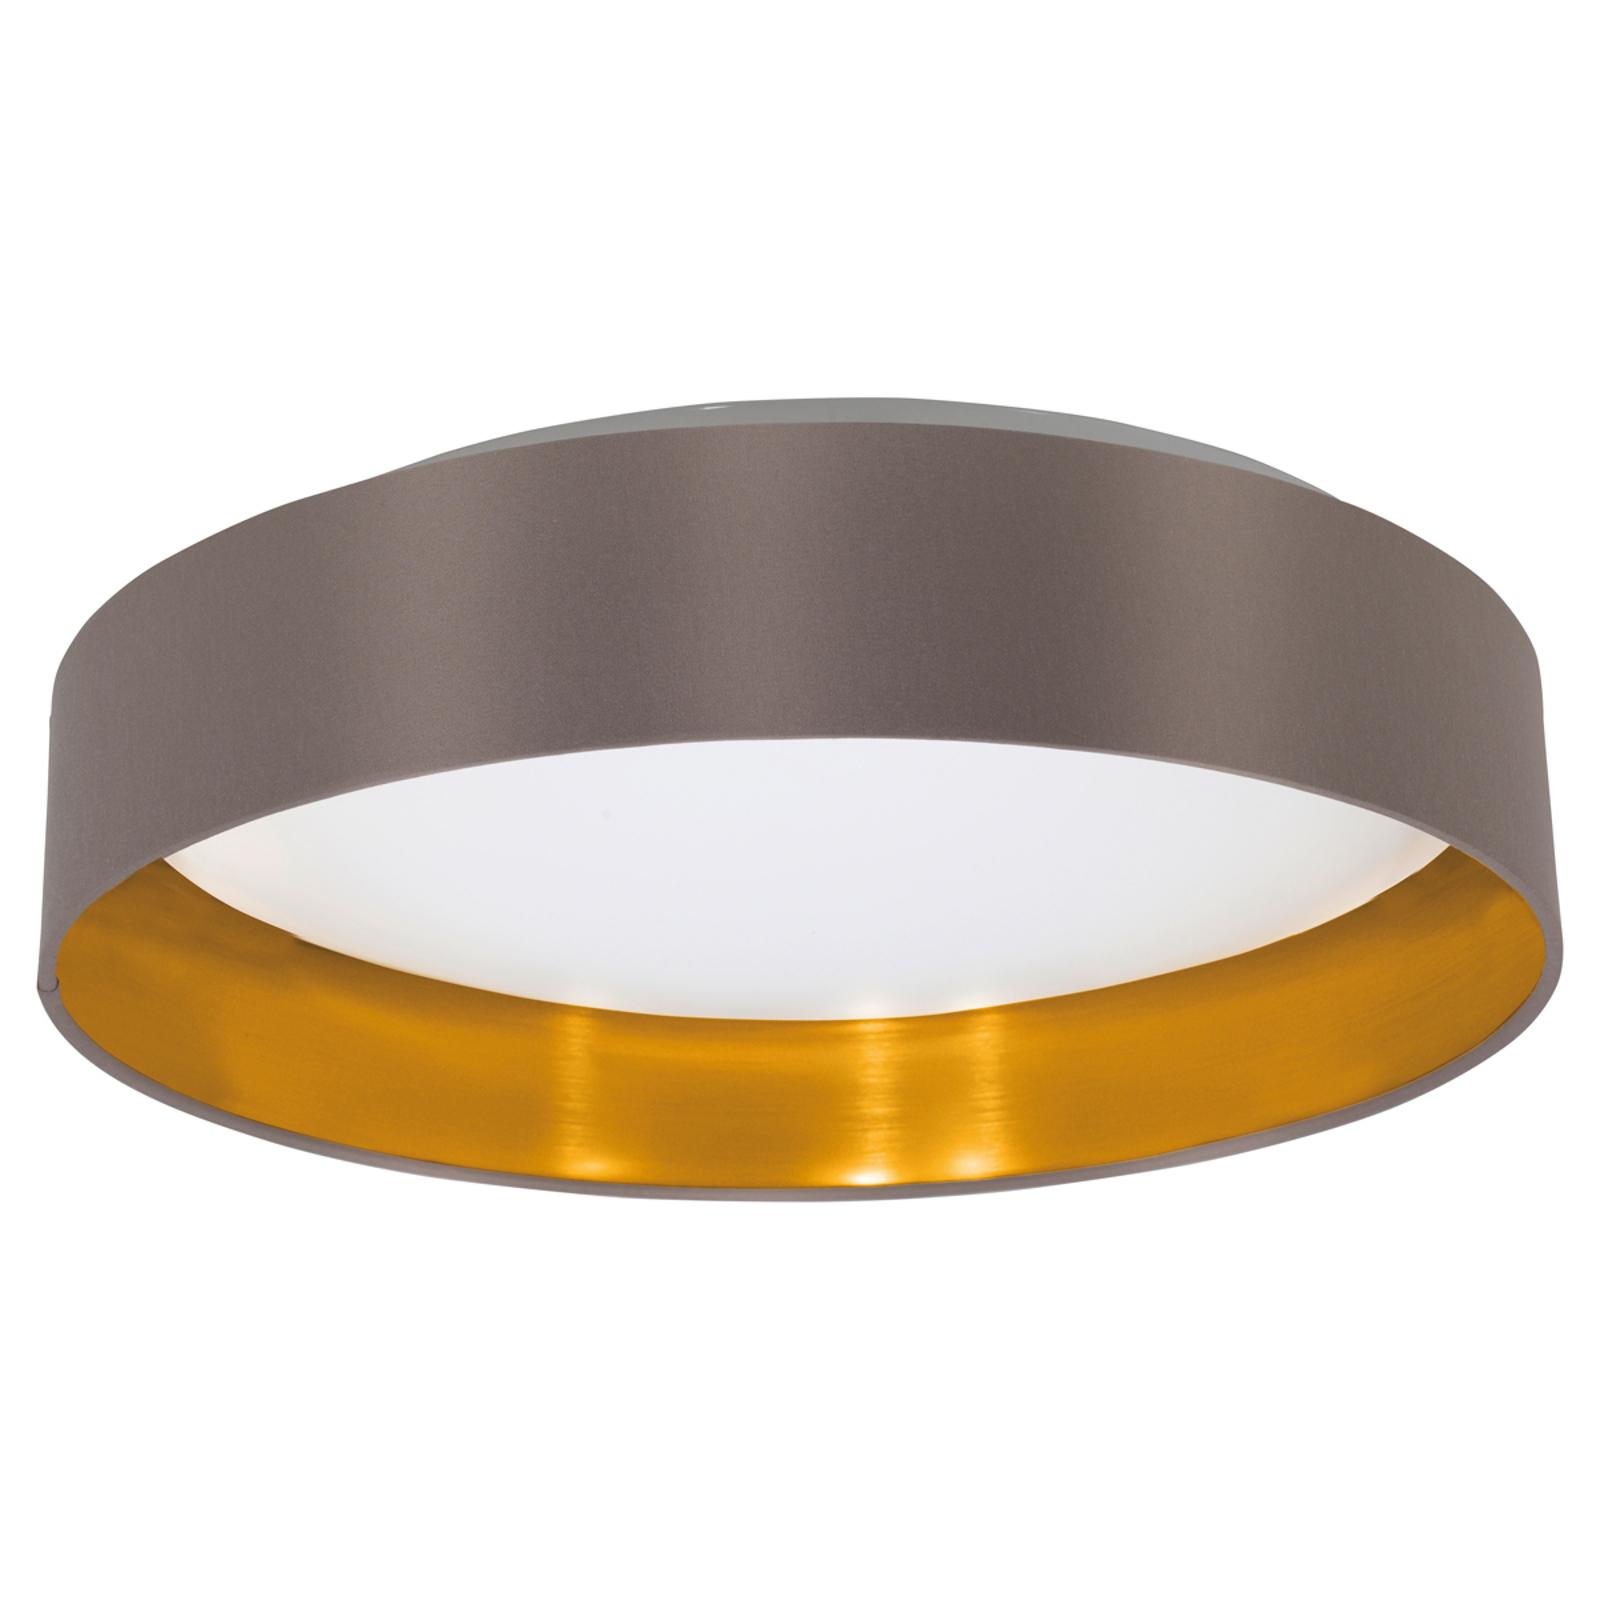 LED plafondlamp Capri uit textiel